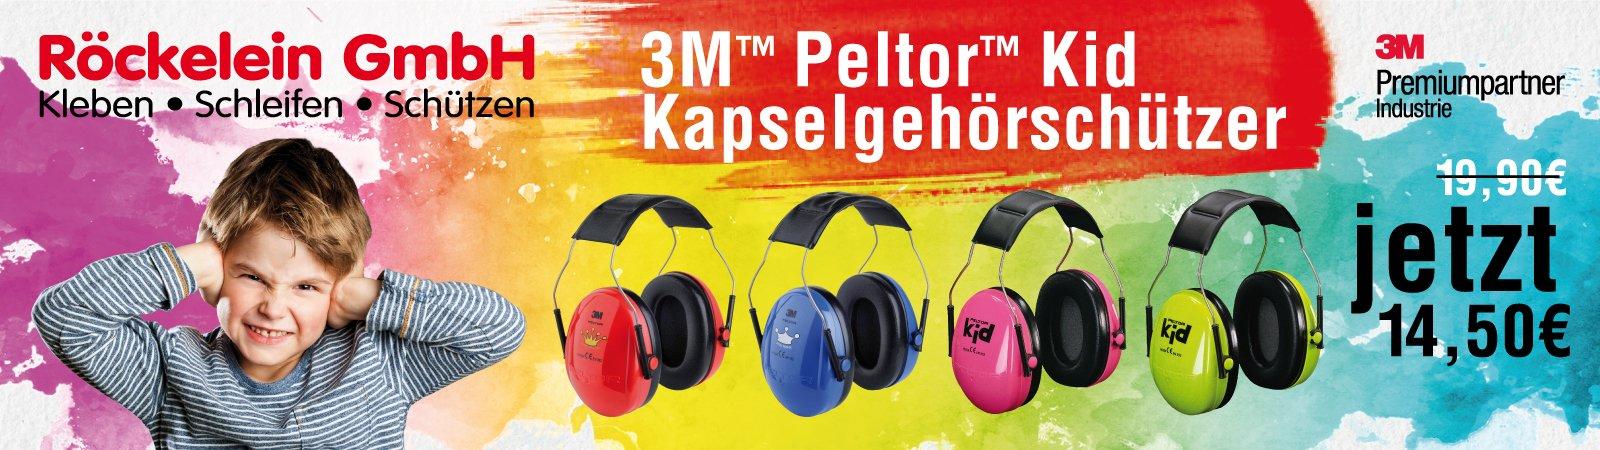 3M Peltor Kid Kapselgehörschützer